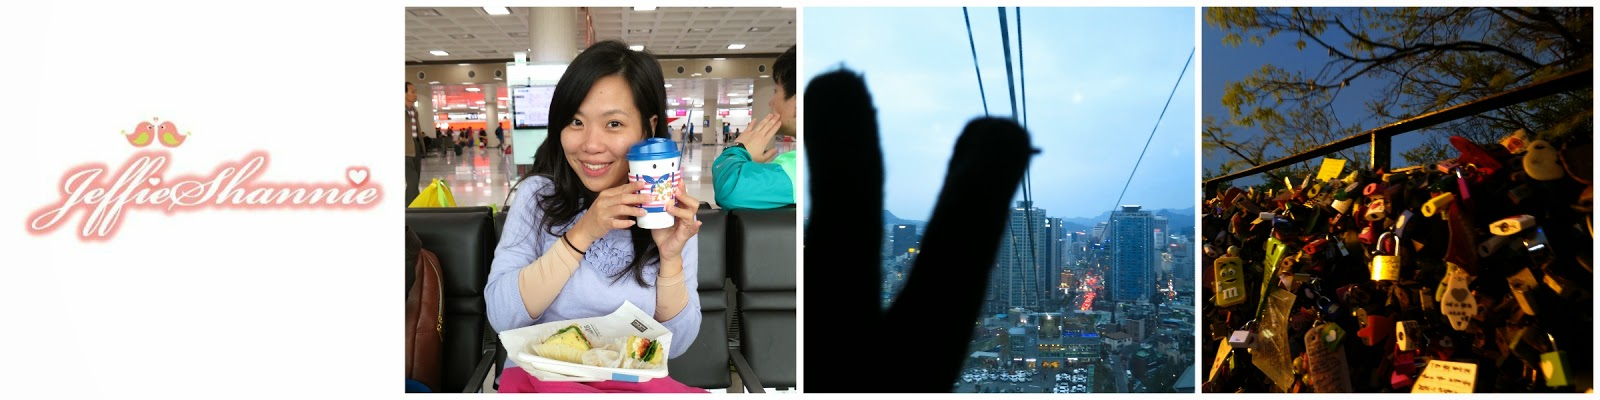 http://jeffieshannie.blogspot.sg/2014/06/seoul-jeju-day-7-jeju-international.html